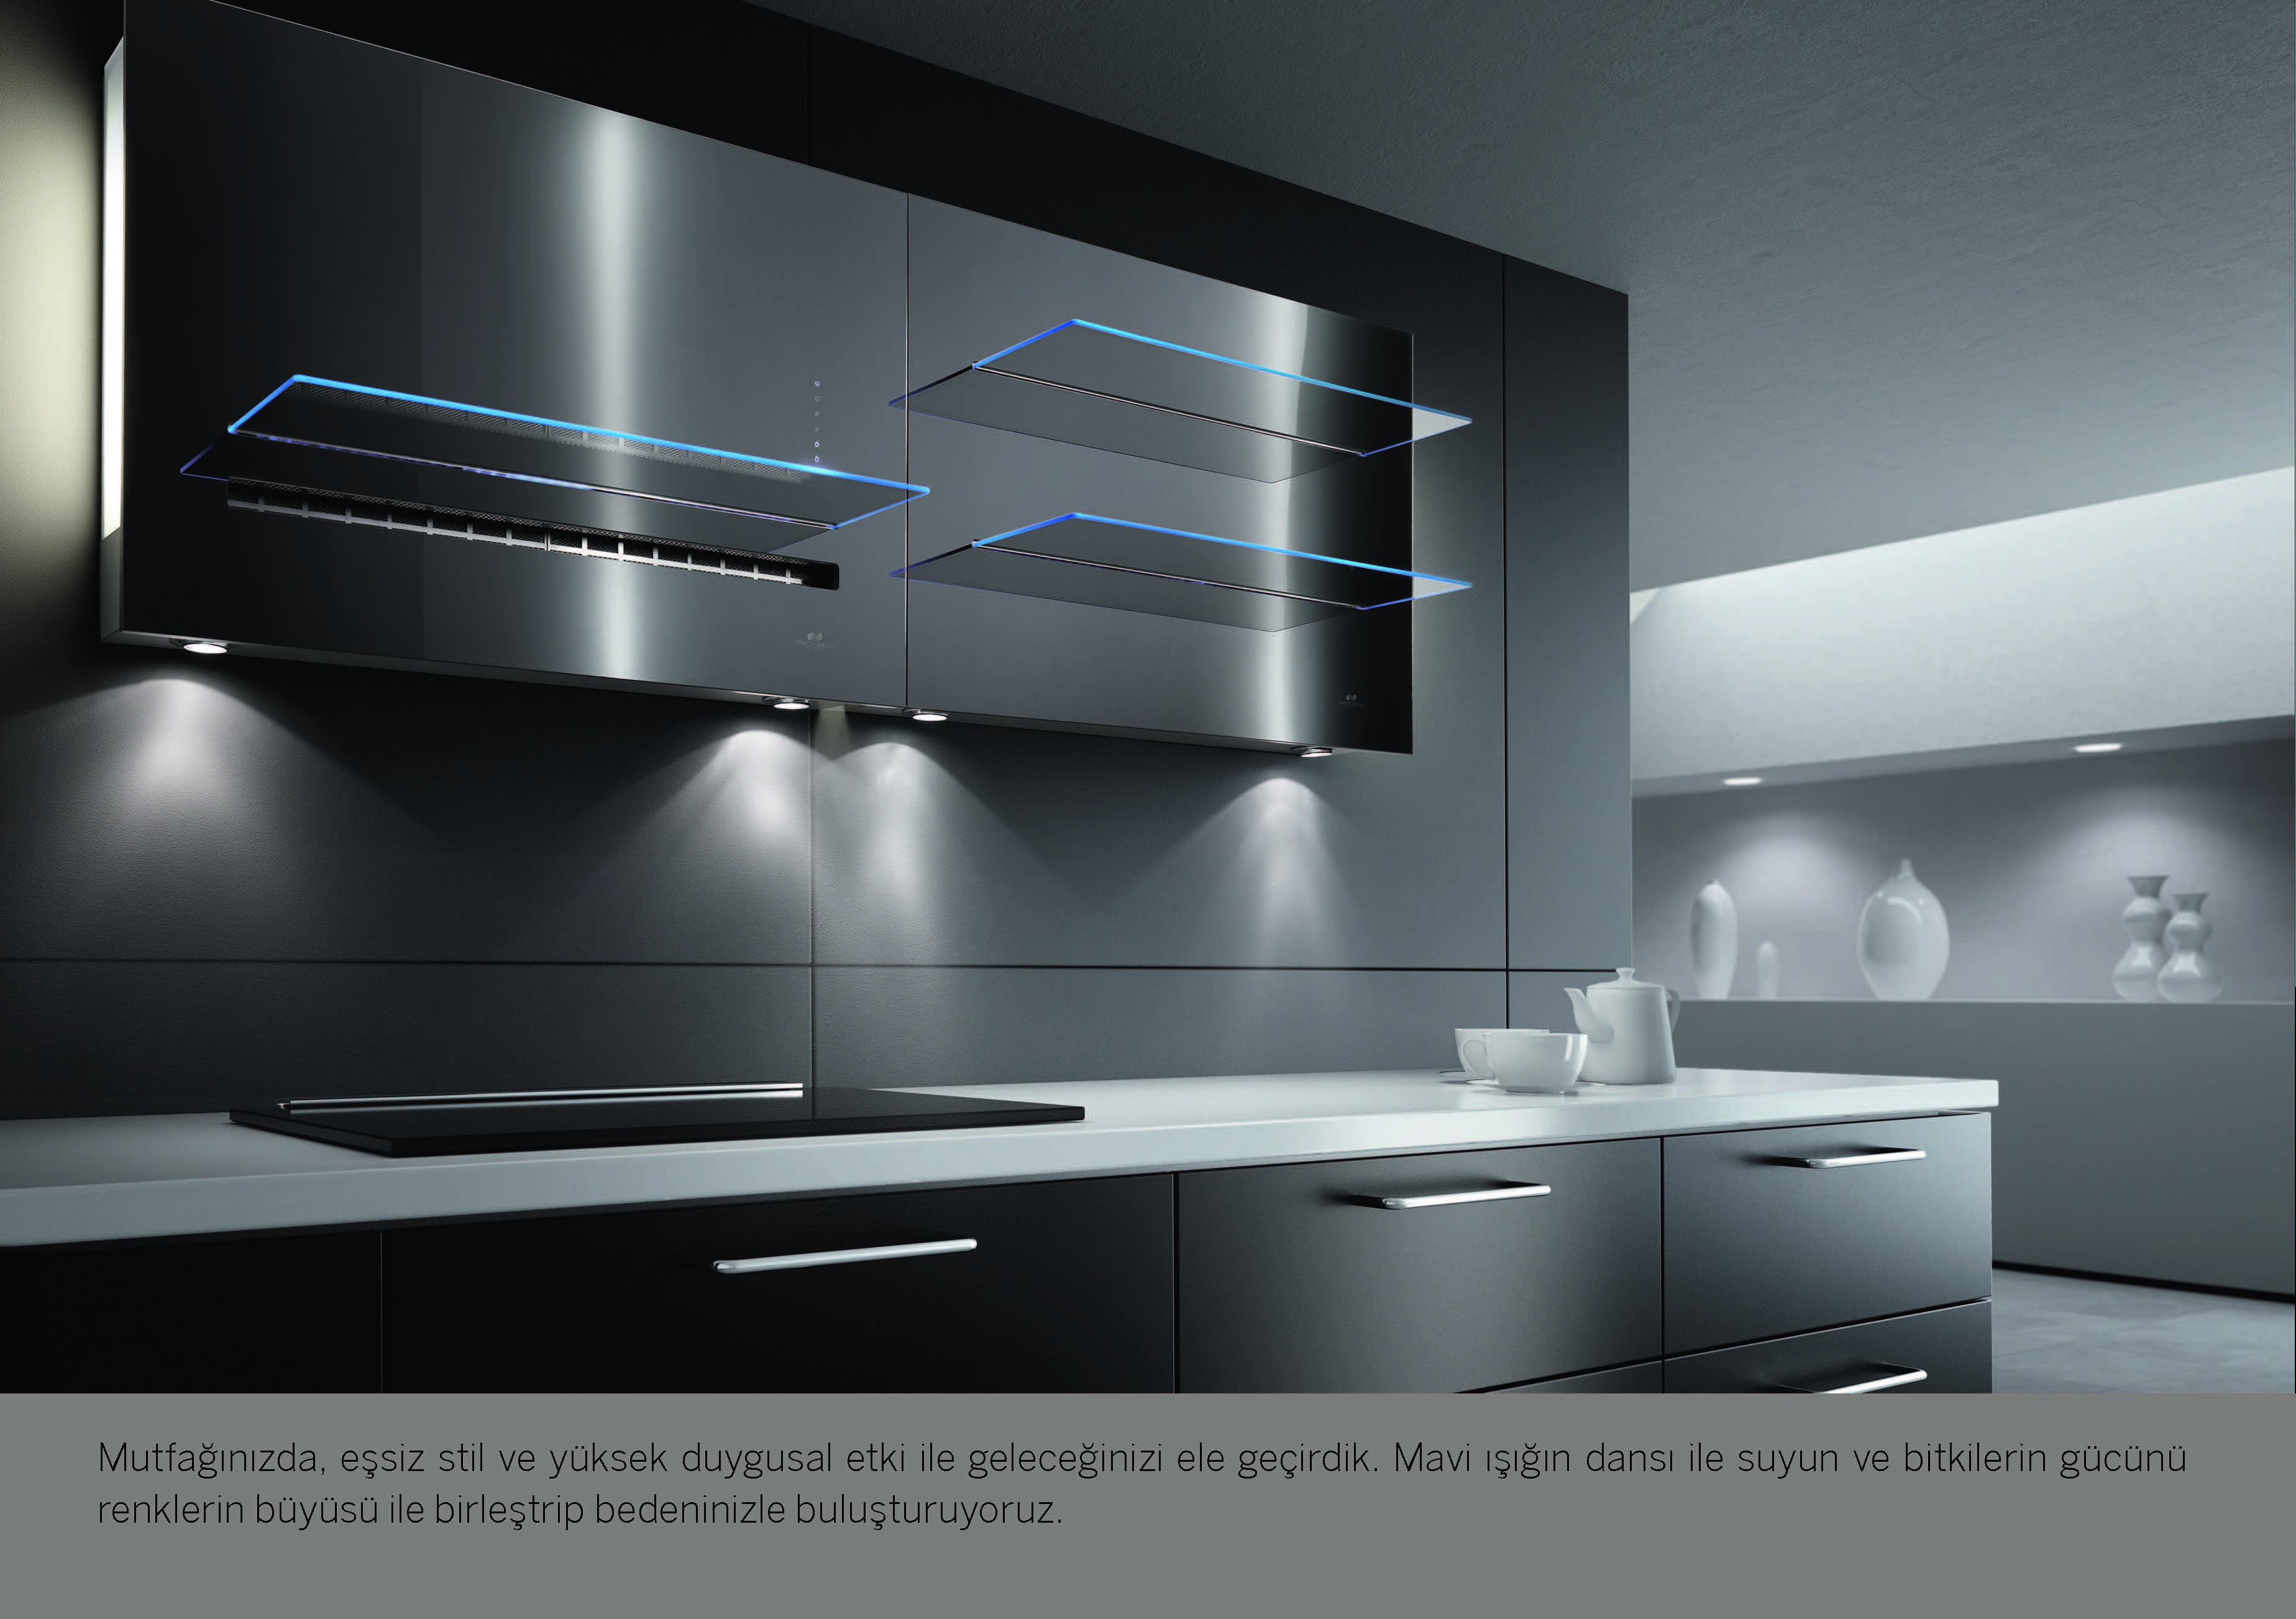 kchen katalog der neue ikea katalog ist da material mdf. Black Bedroom Furniture Sets. Home Design Ideas